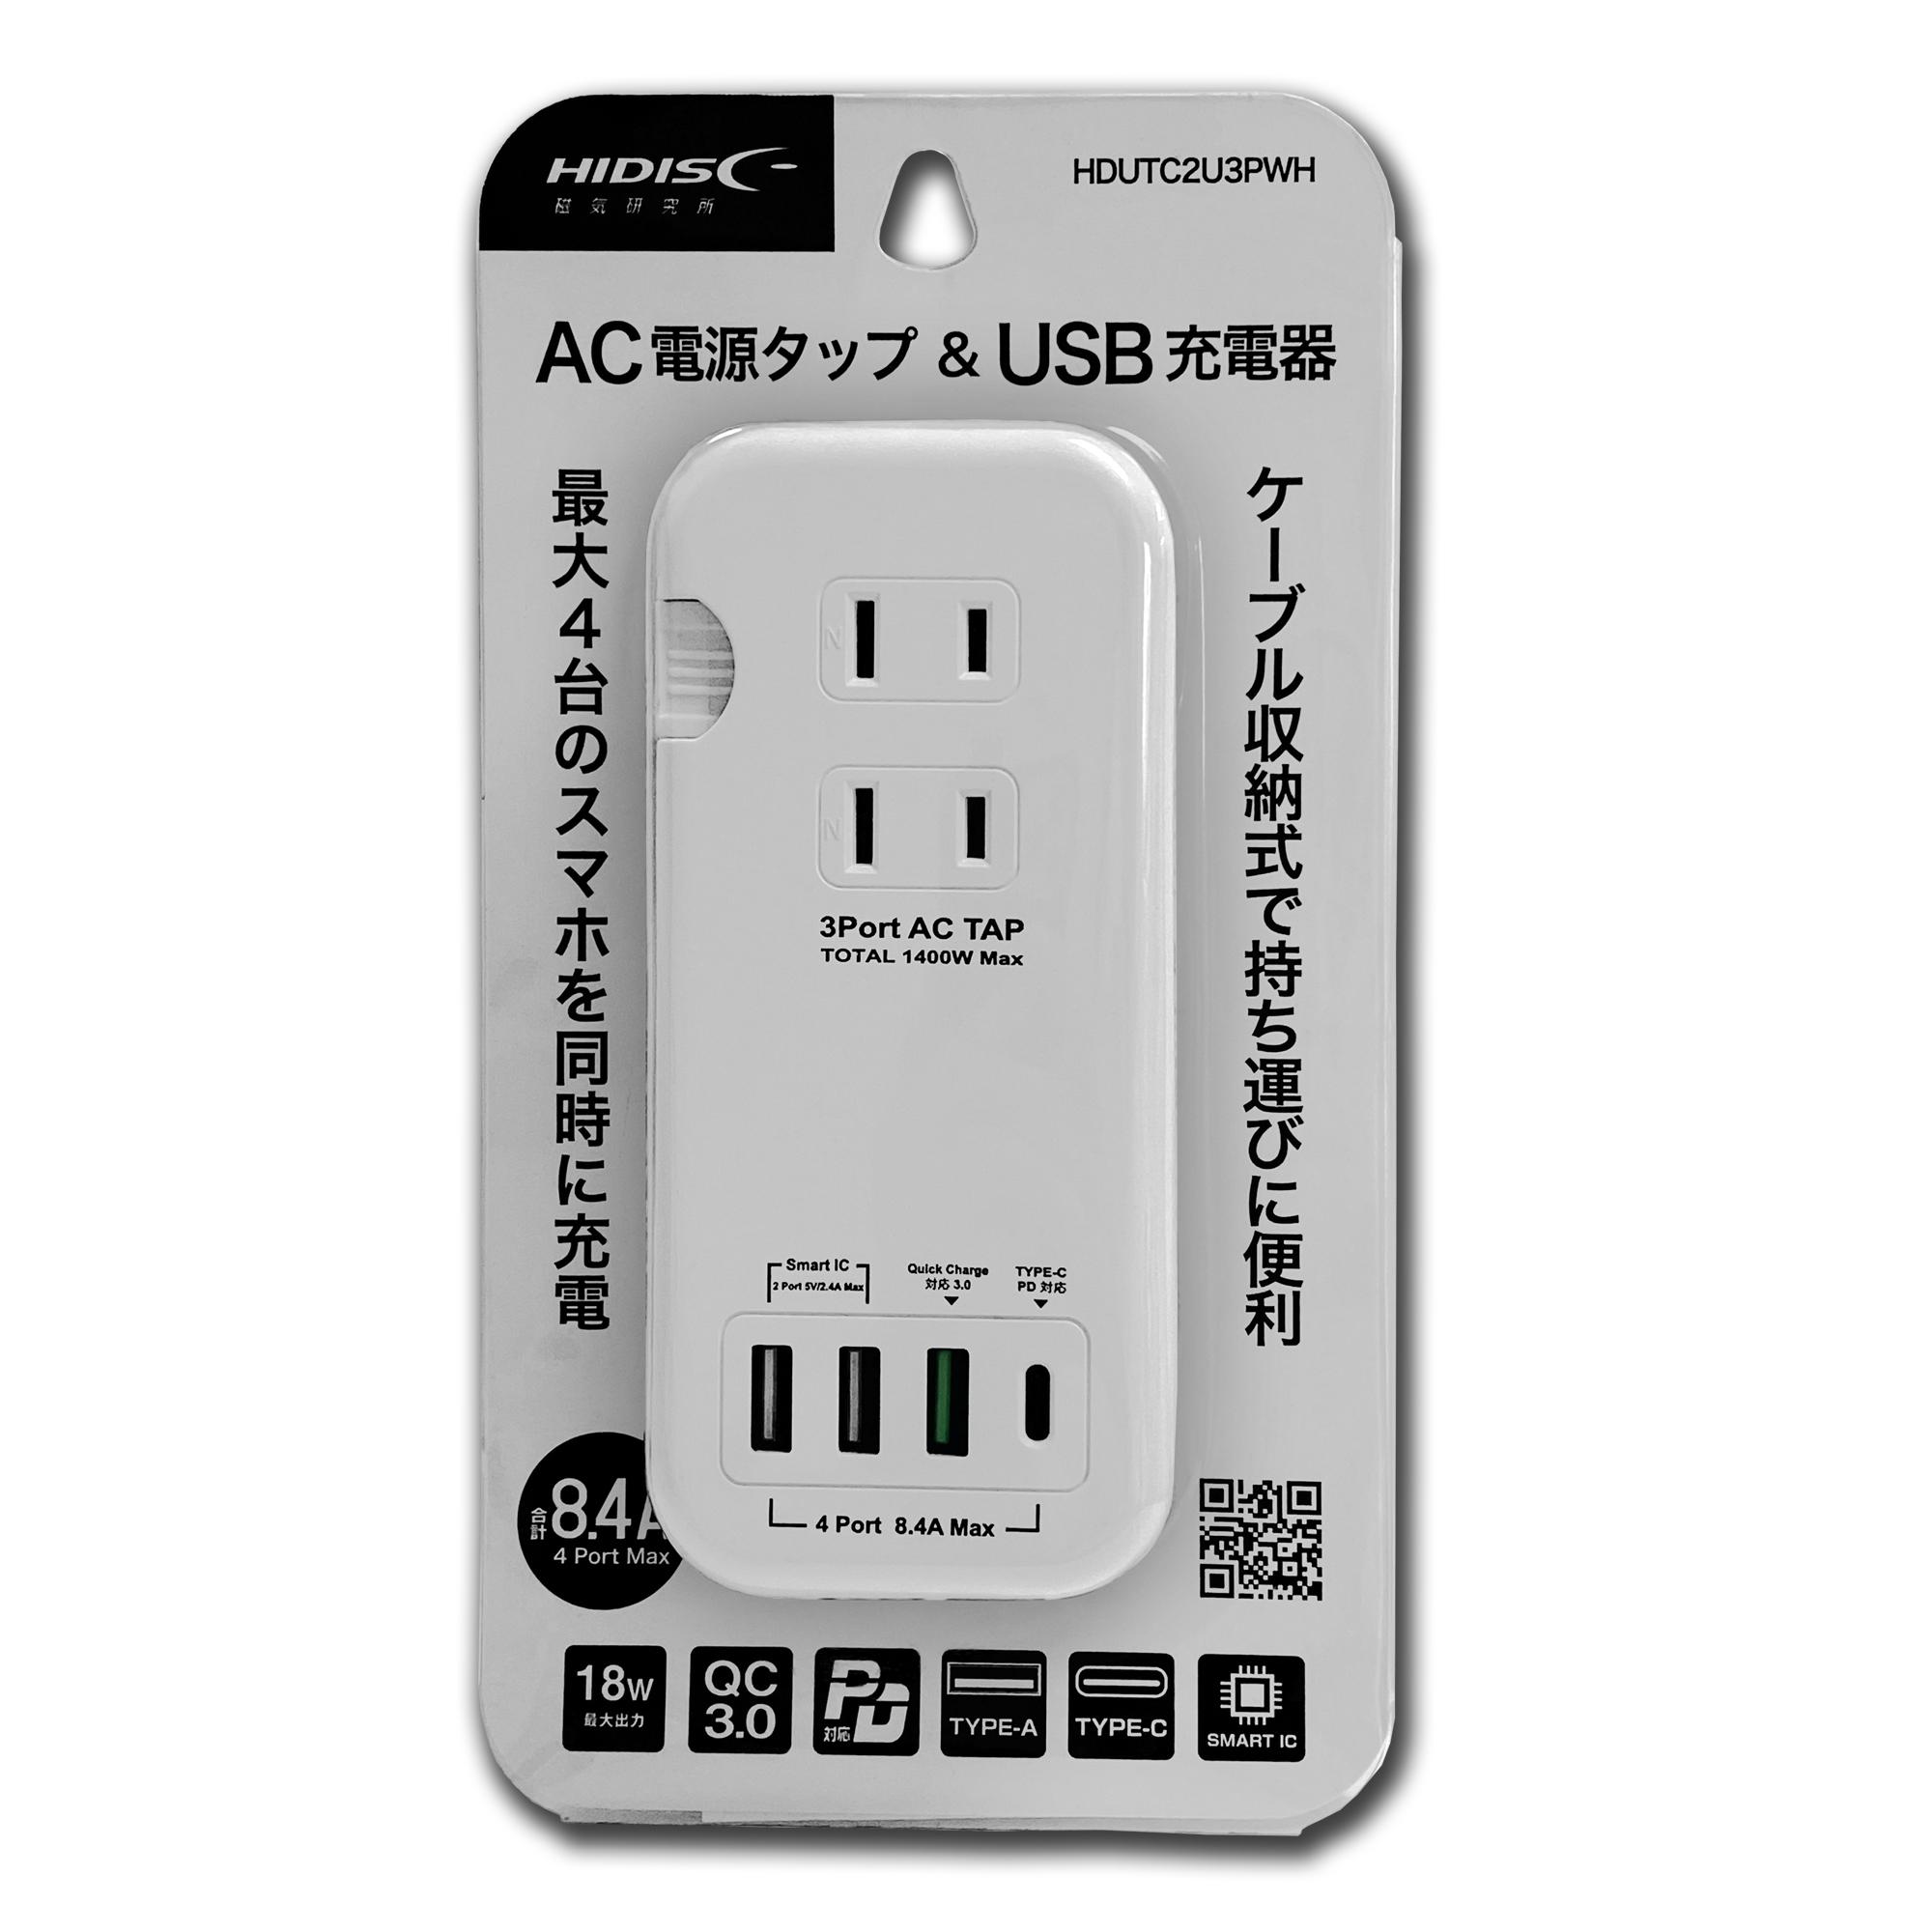 HIDISC 最大出力18W QC3.0 PD対応 AC電源タップ & USB充電器 HDUTC2U3PWH